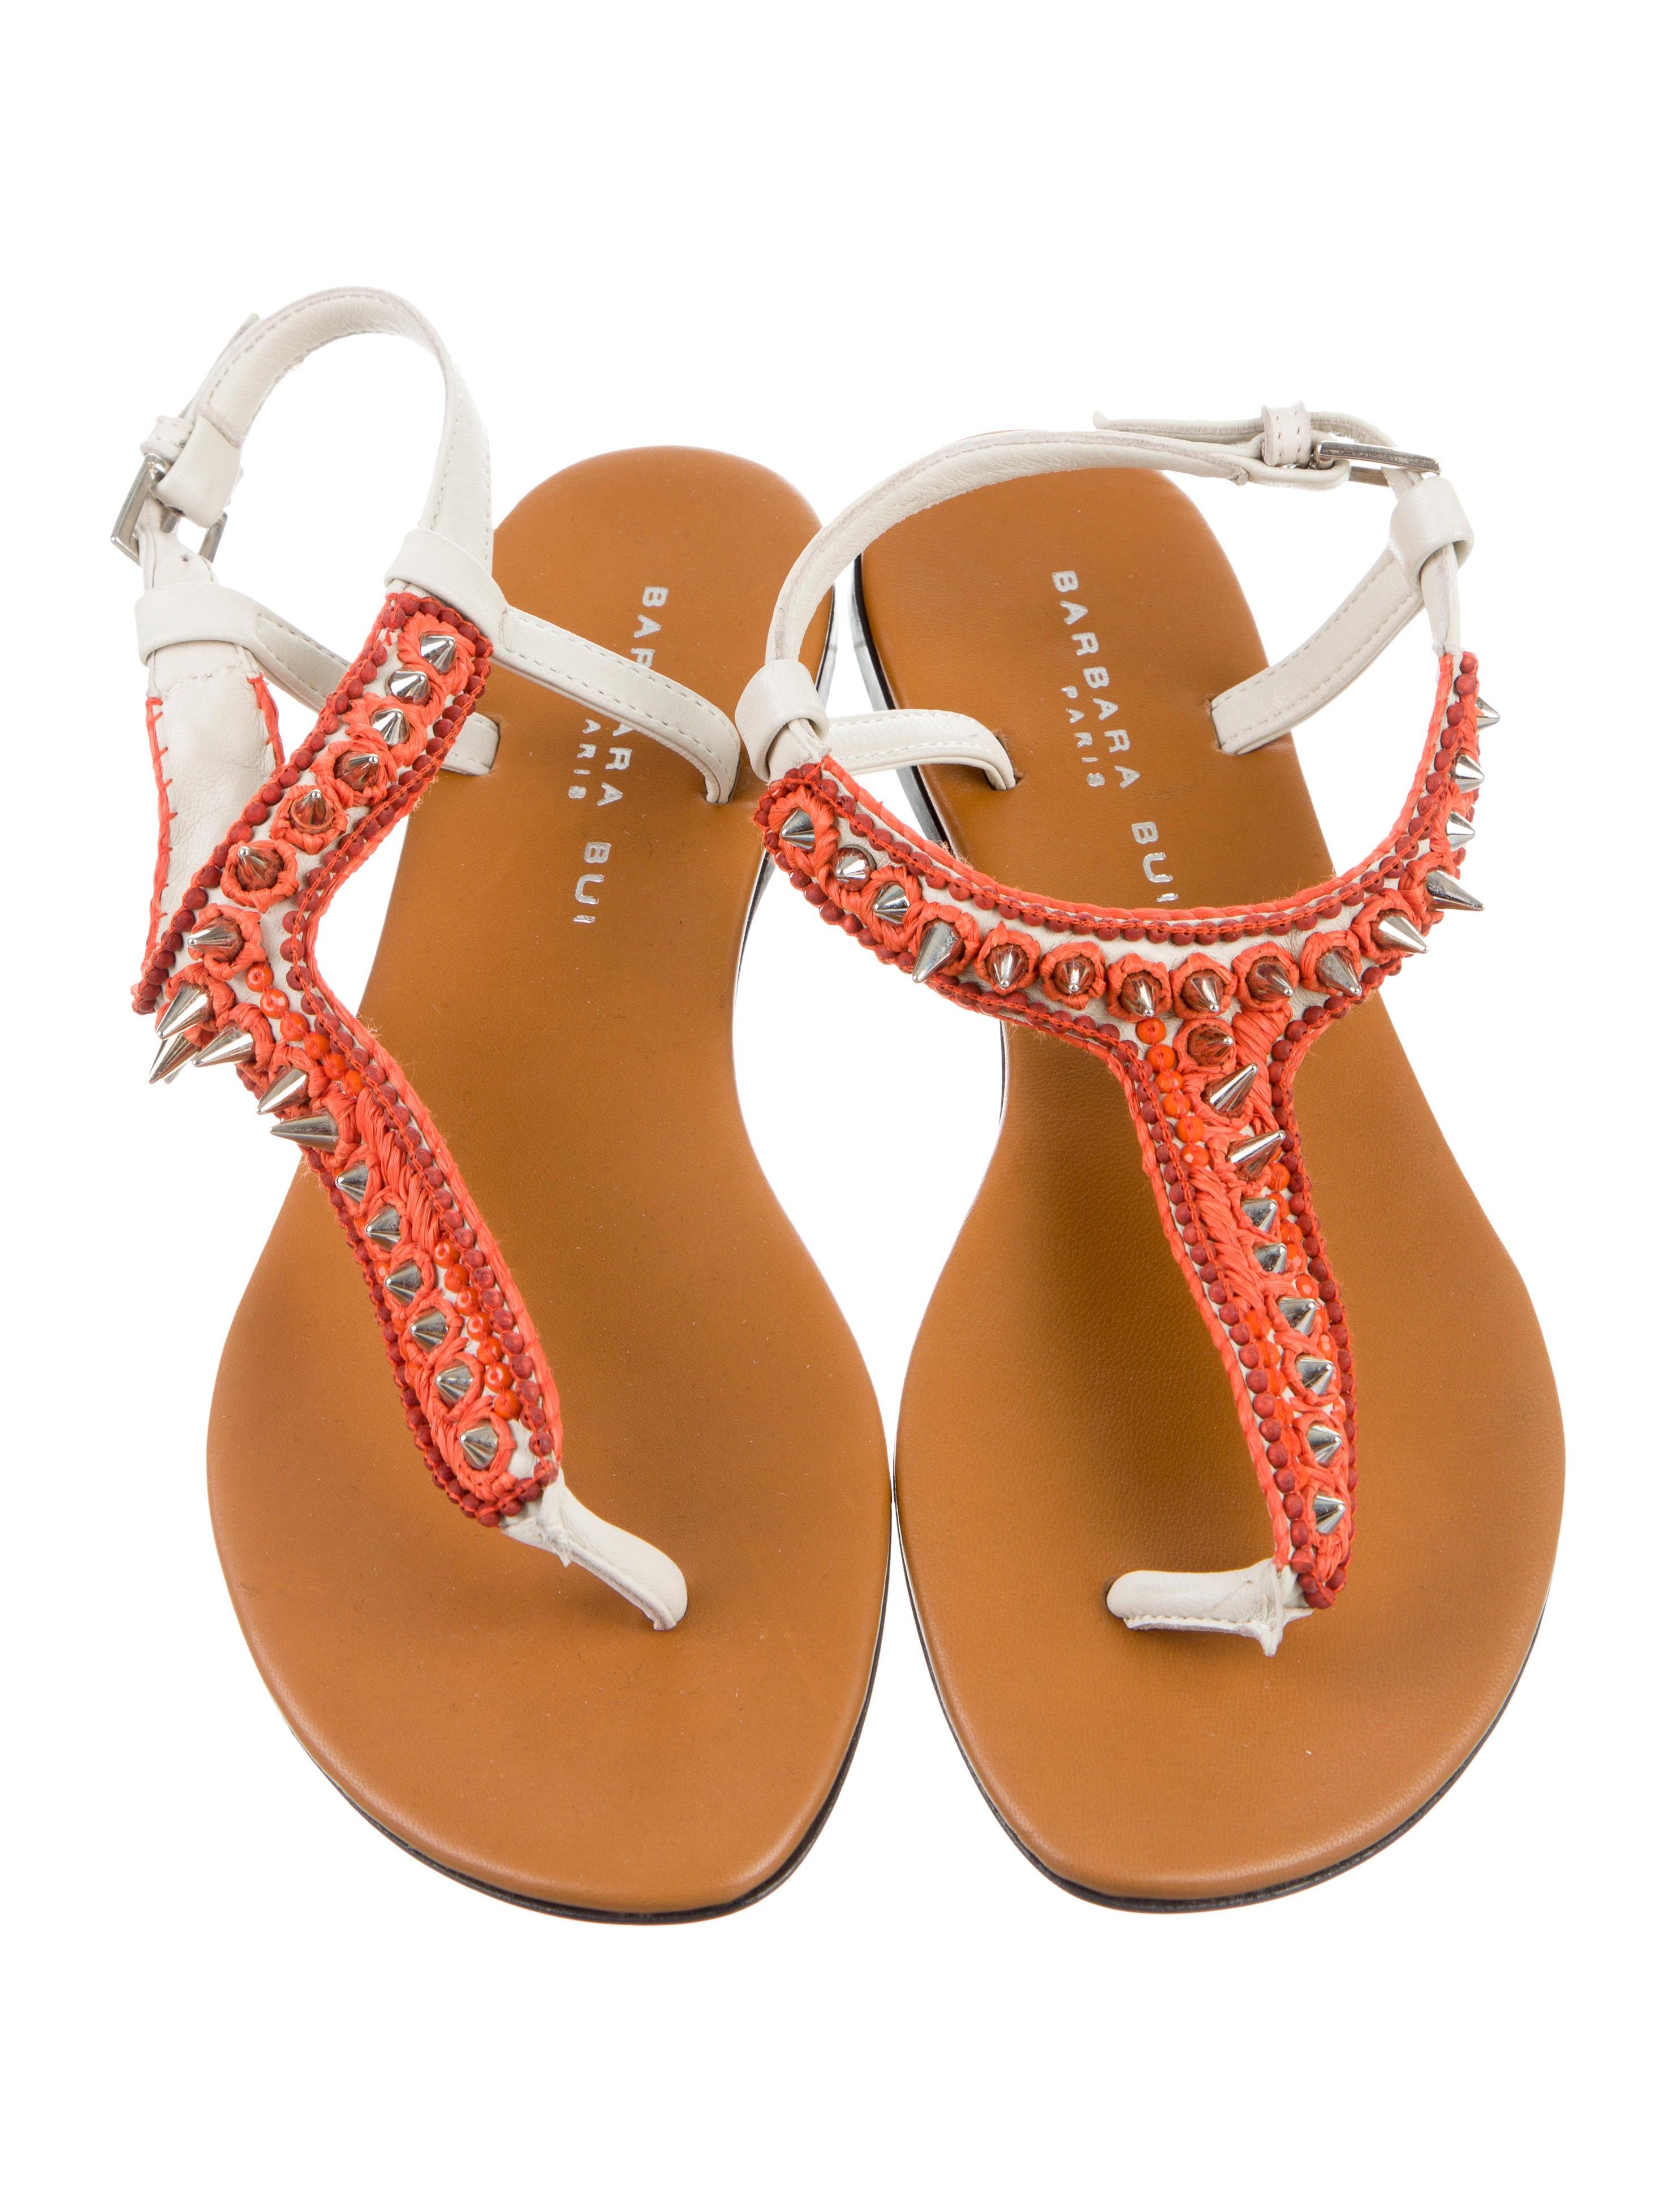 Barbara Bui Paracas Studded Sandals w/ Tags geniue stockist online sale Cheapest cheap sale supply discount explore CzjcEJKvH8